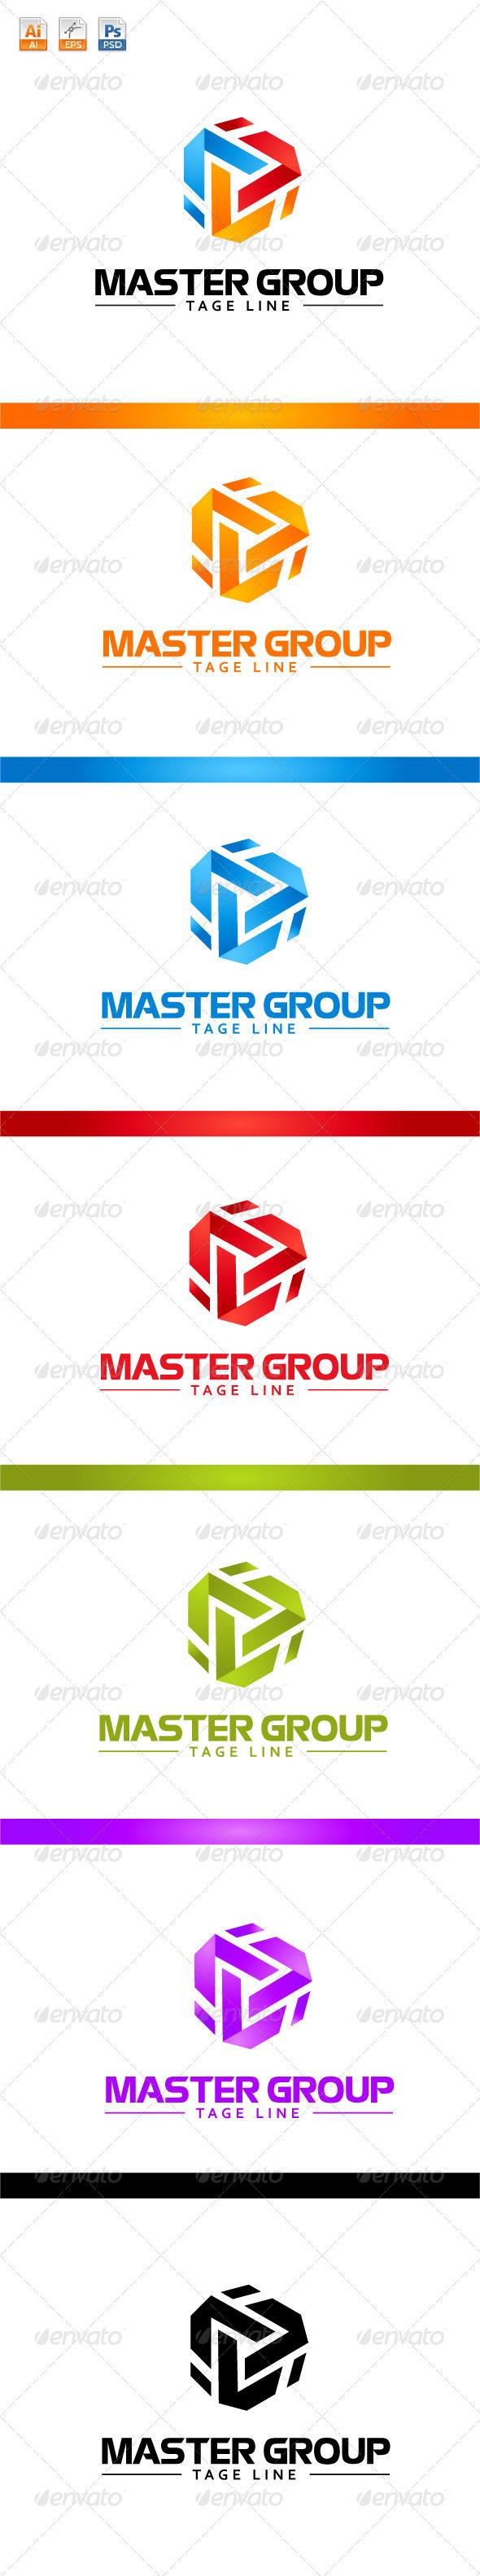 GraphicRiver Master Group Logo 3725896